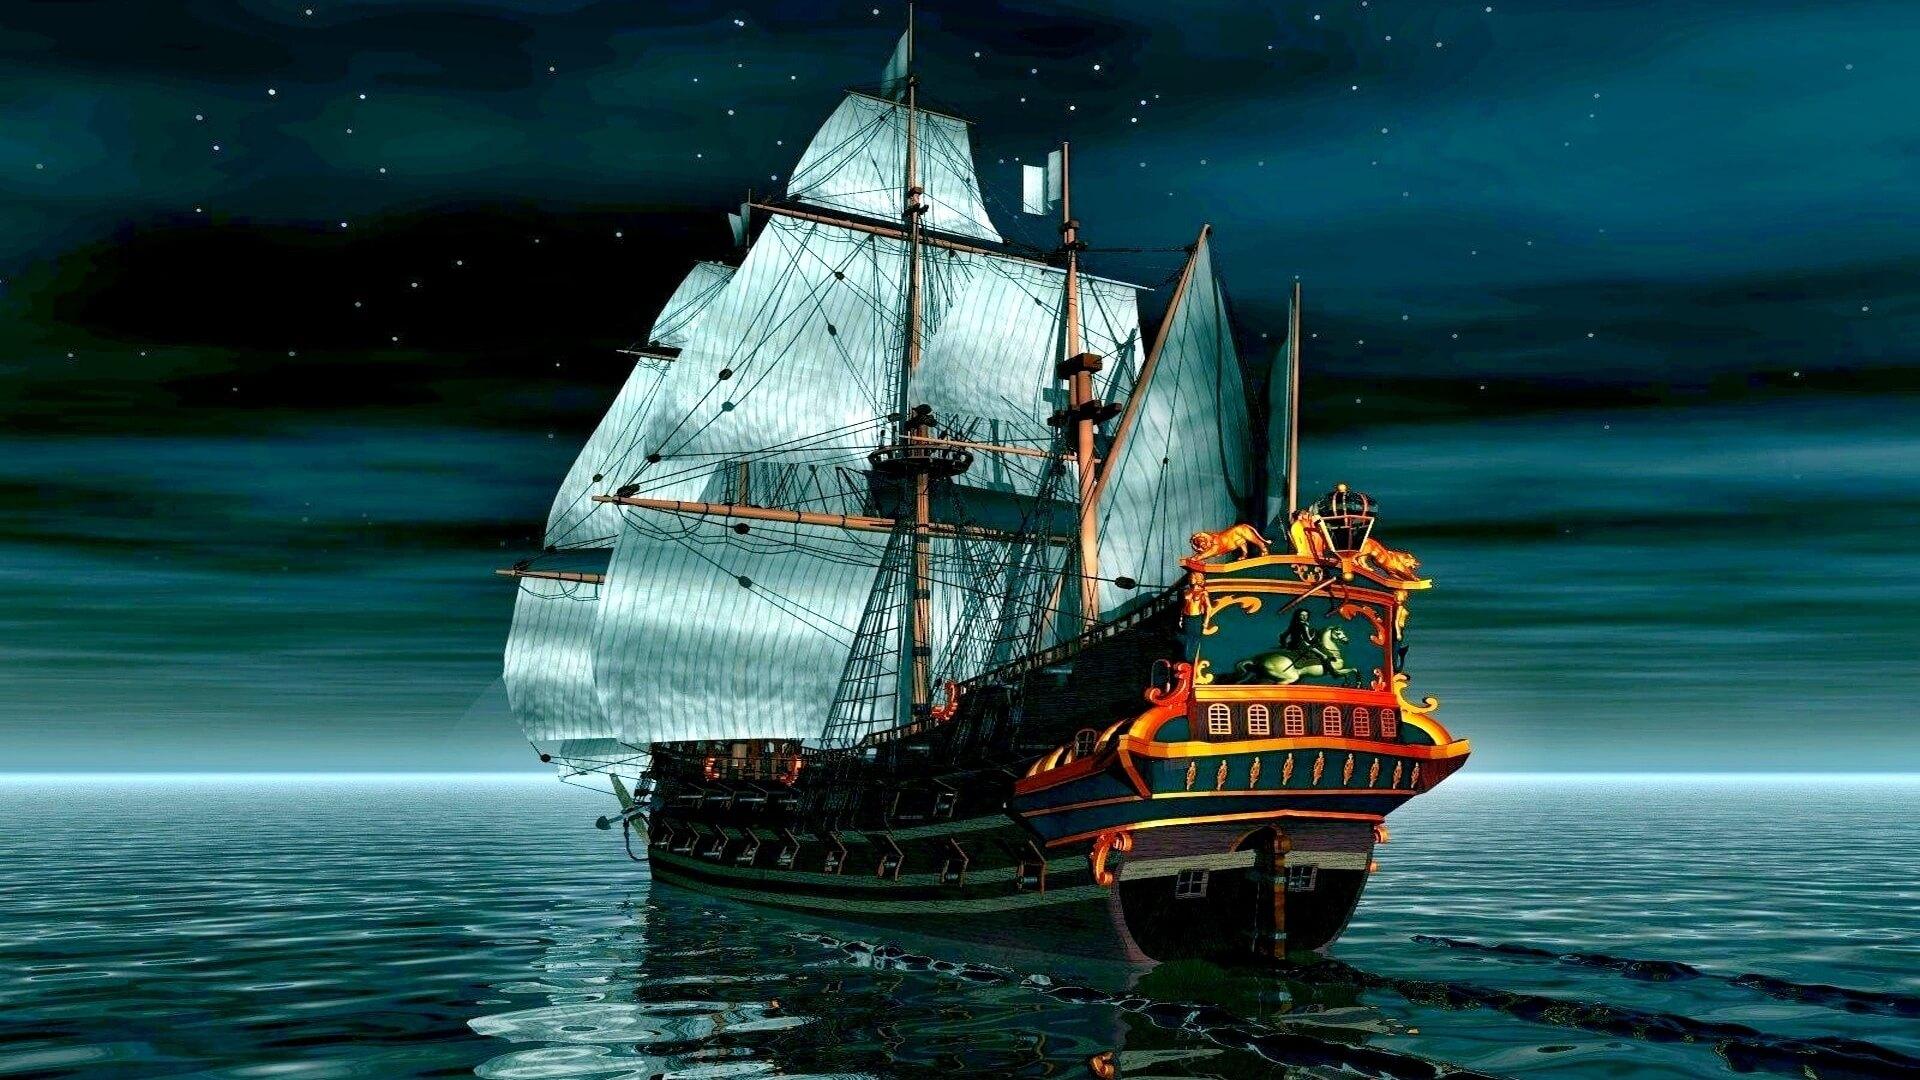 картинка корабль на телефон обои время одним